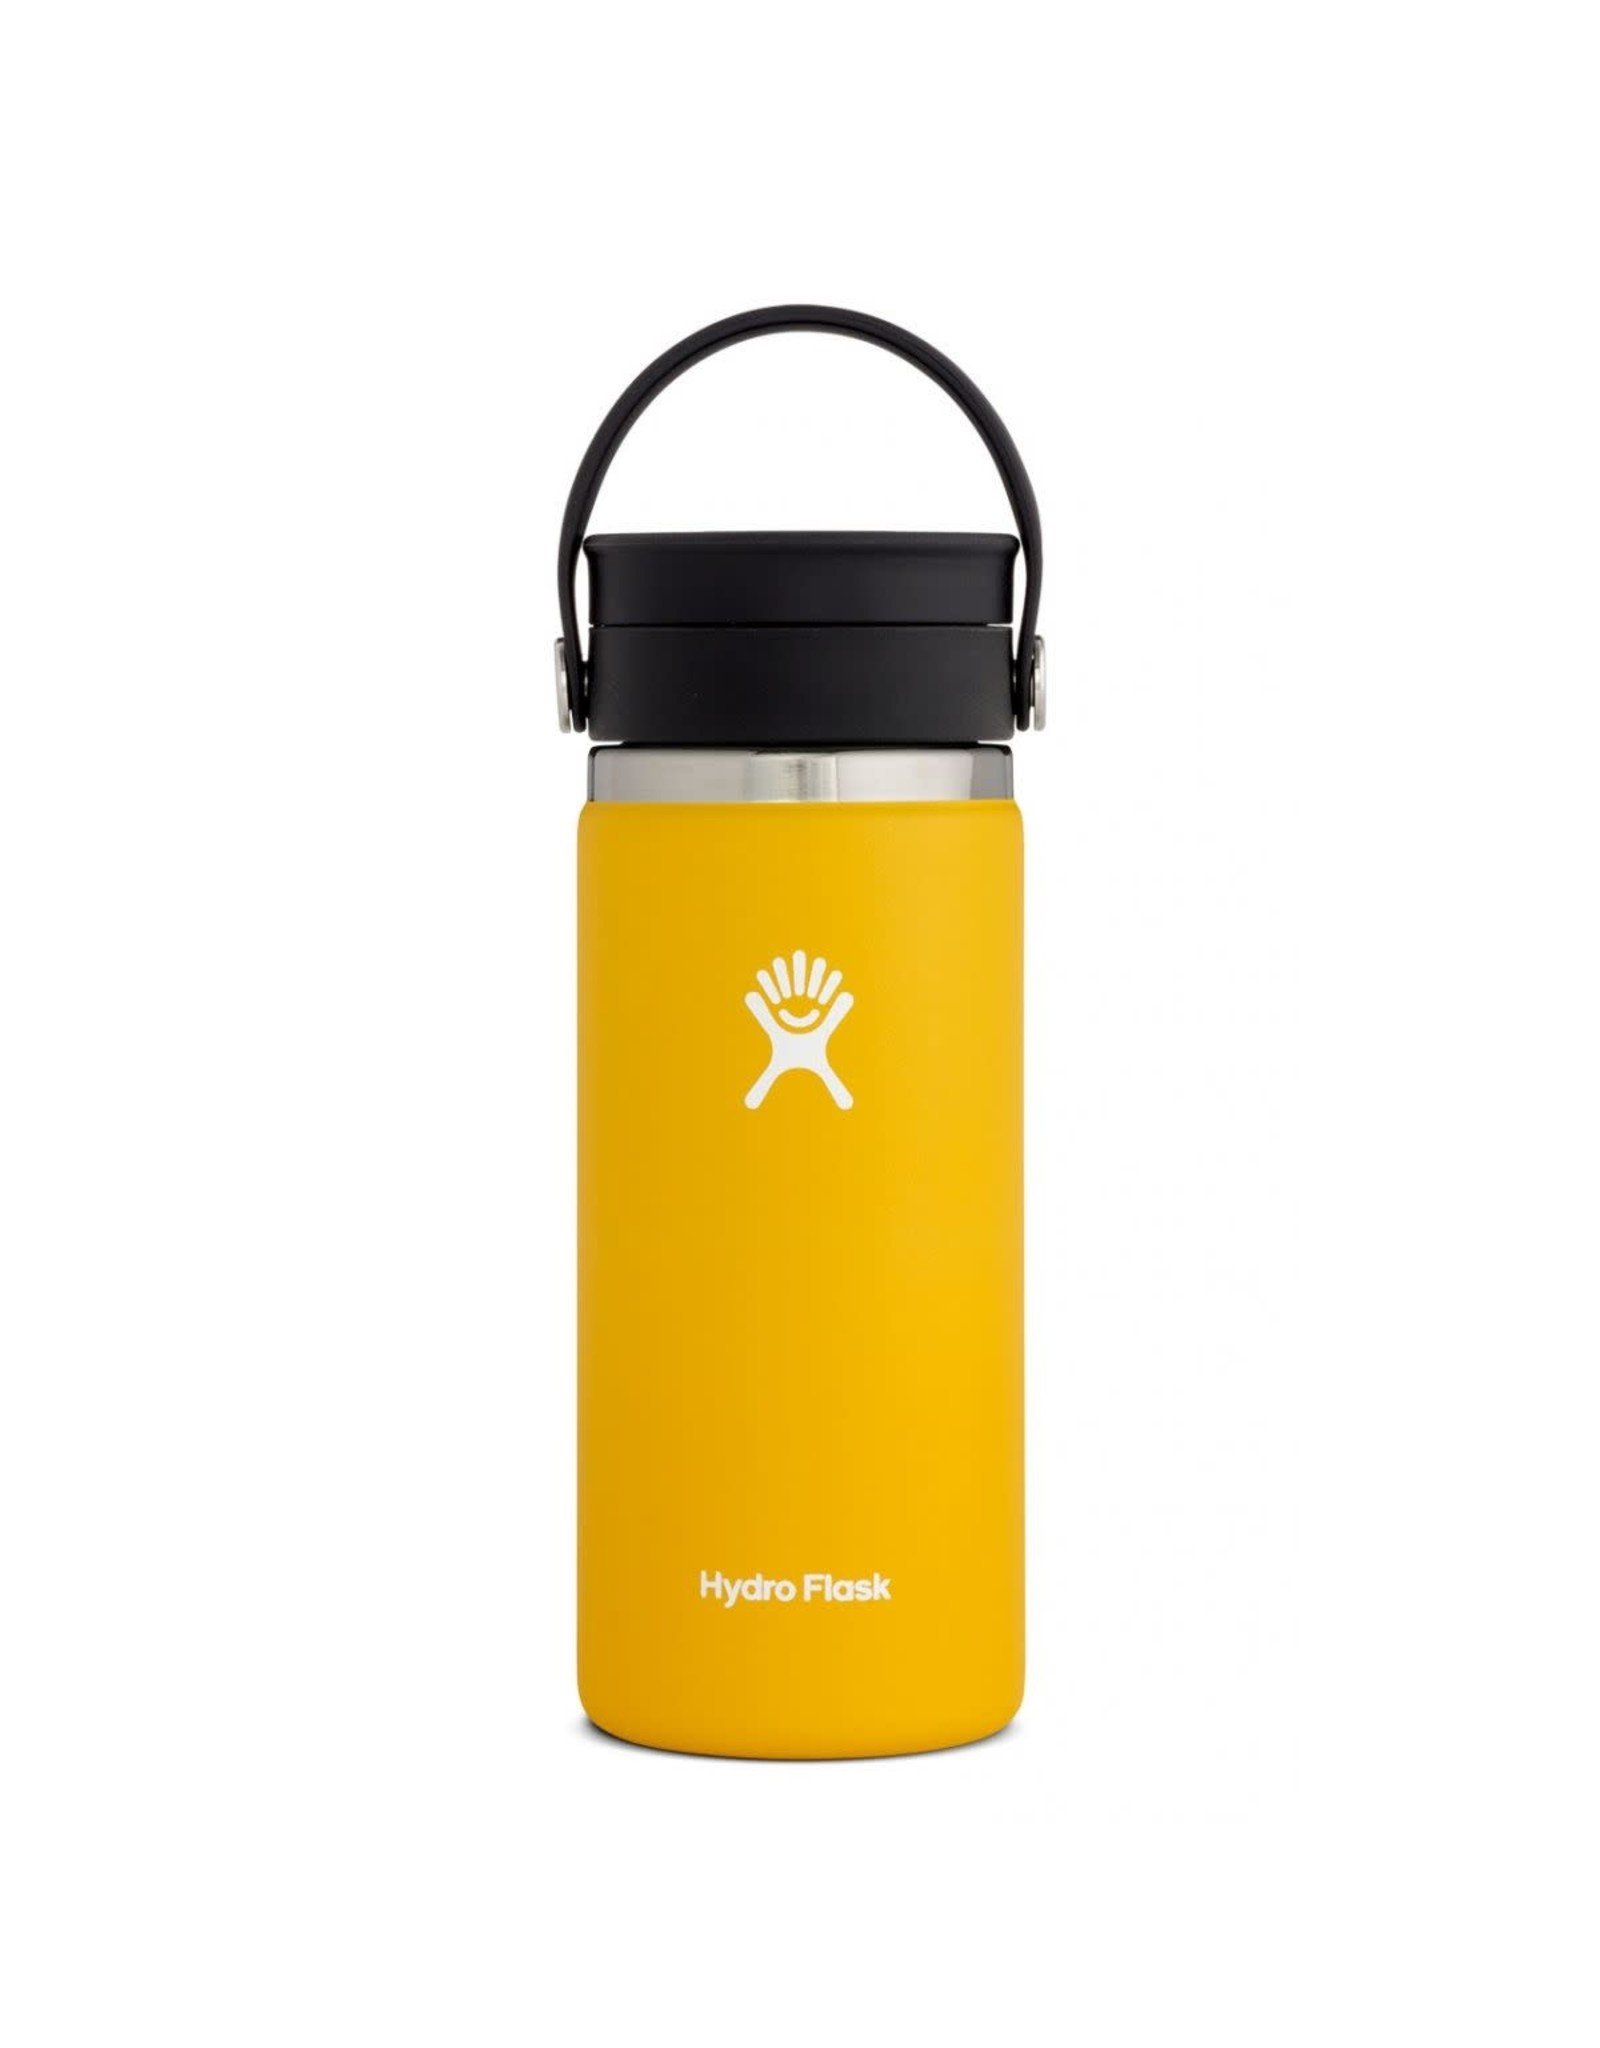 Hydro Flask Hydro Flask 16oz Wide Mouth Flex Sip Lid Sunflower